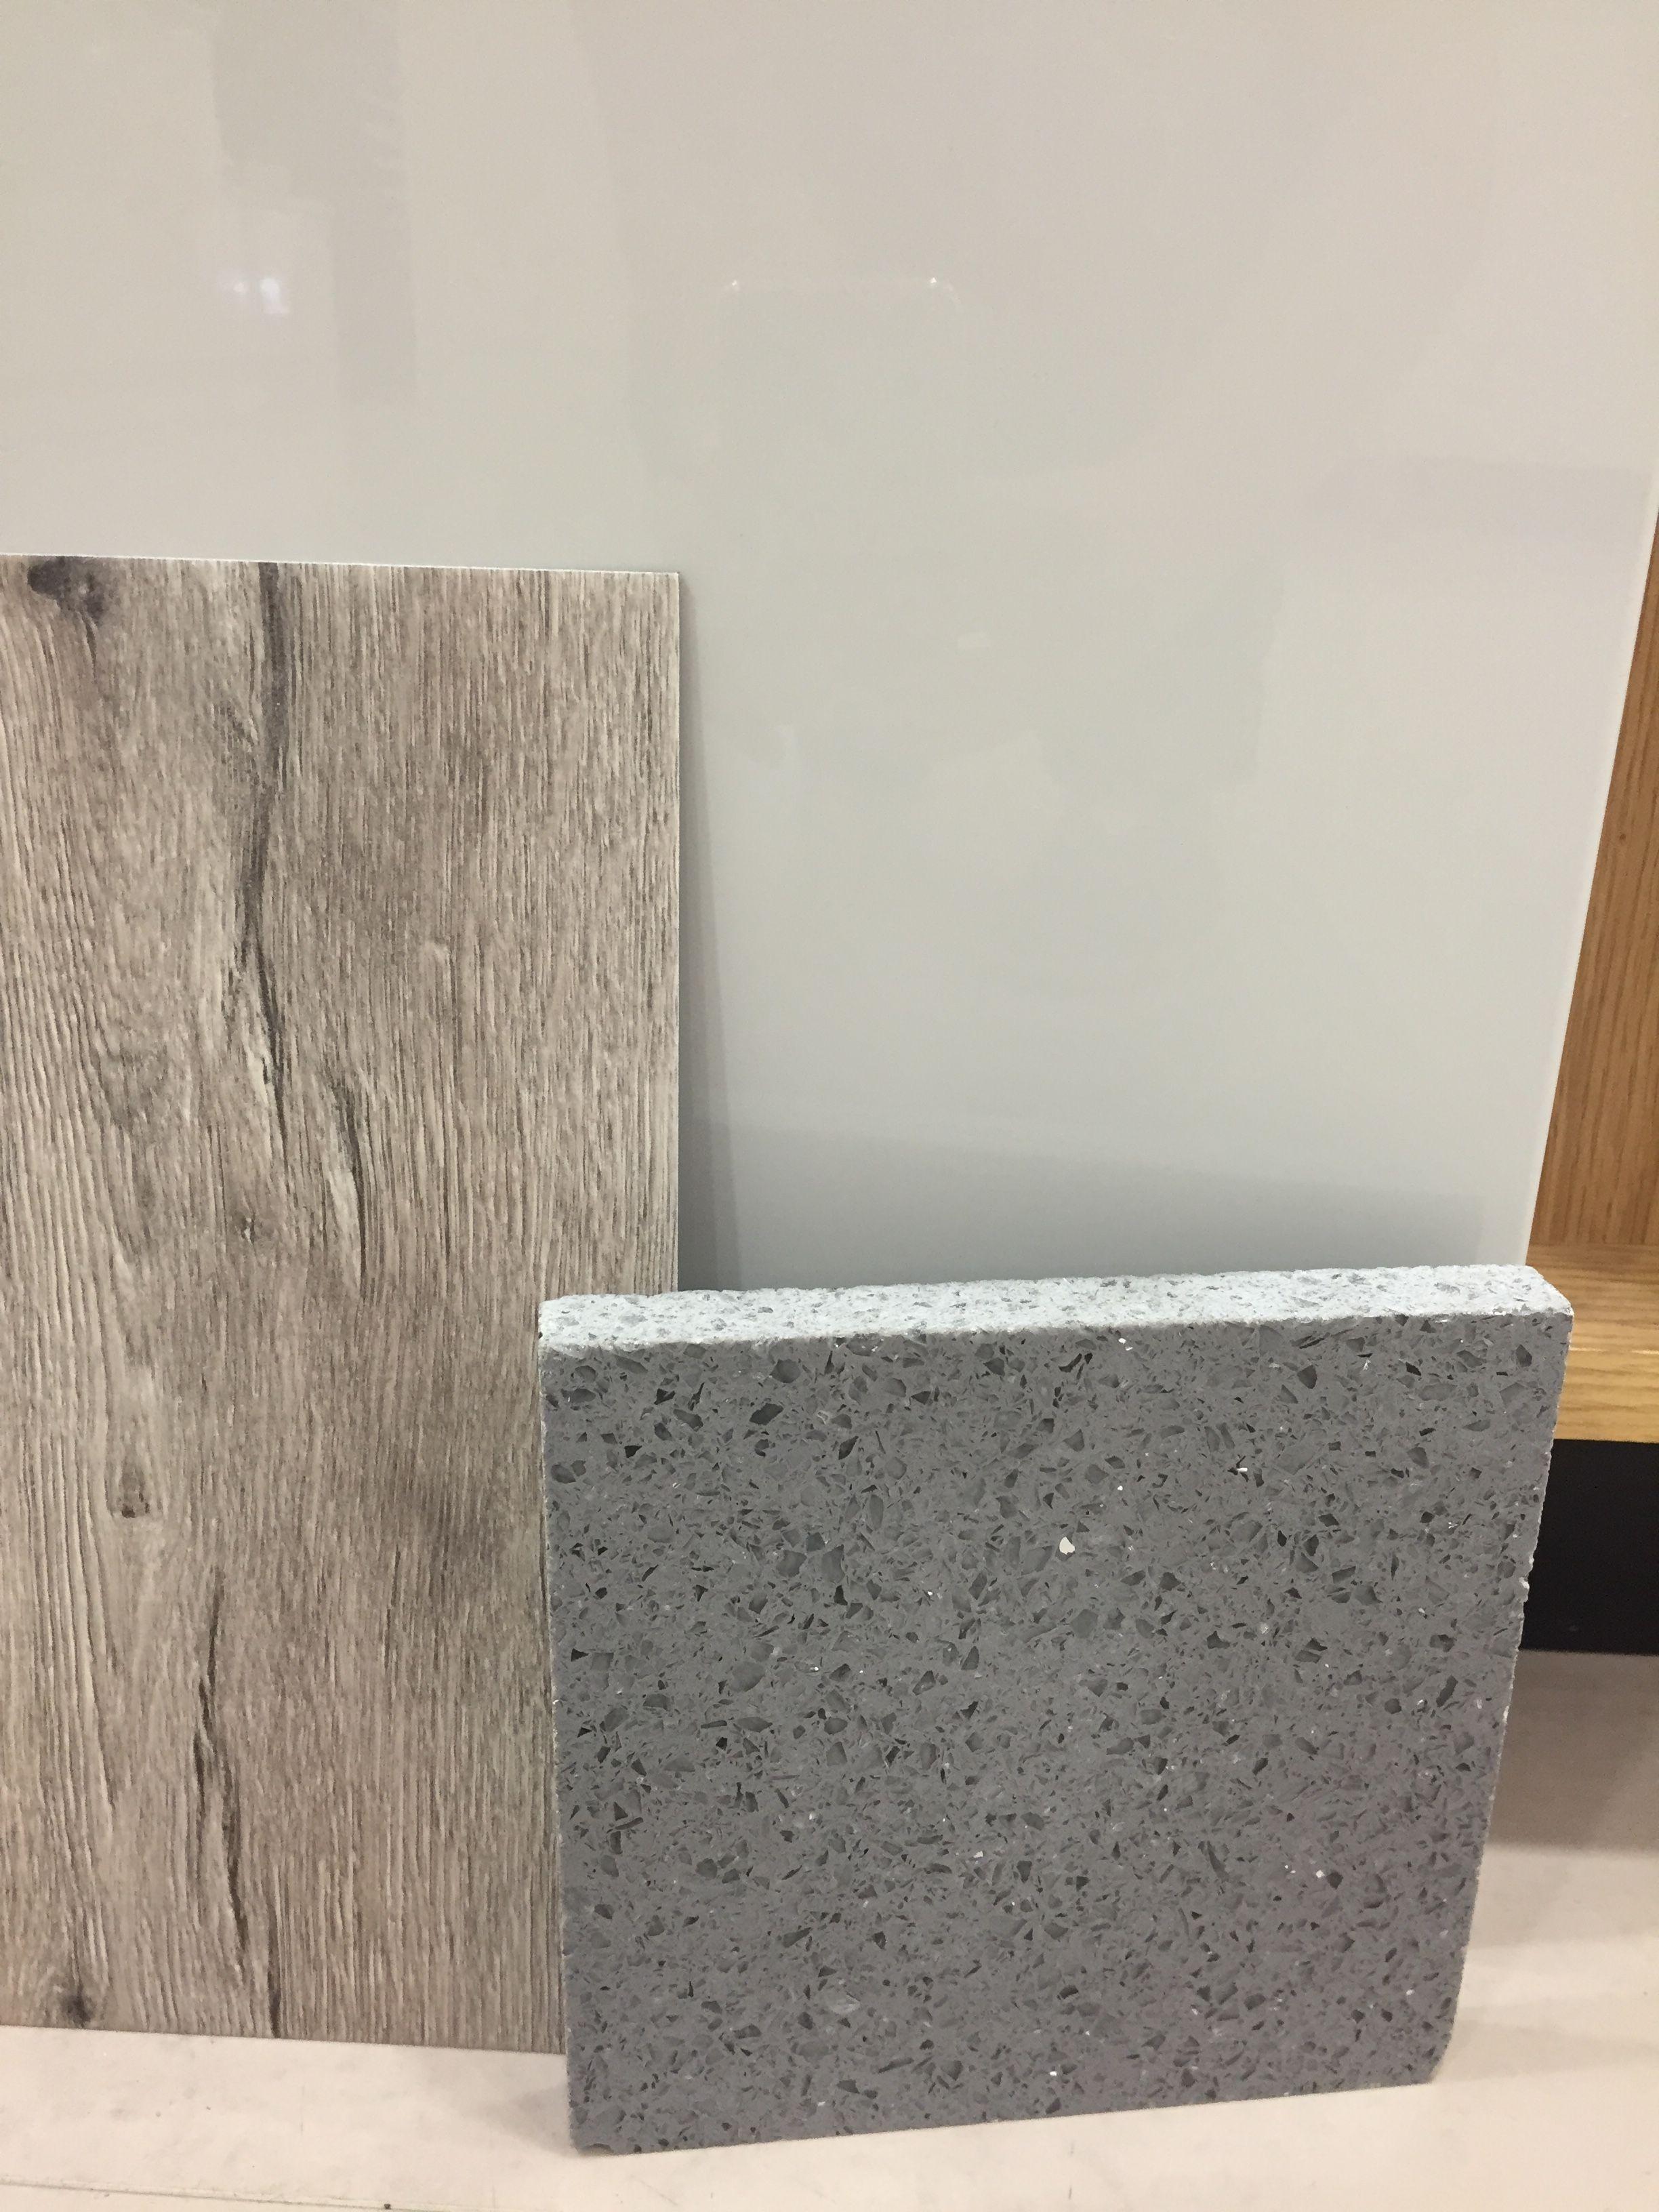 Benchmarx grey gloss, Moduleo Mountain Oak and Stellar Celeste Silestone.